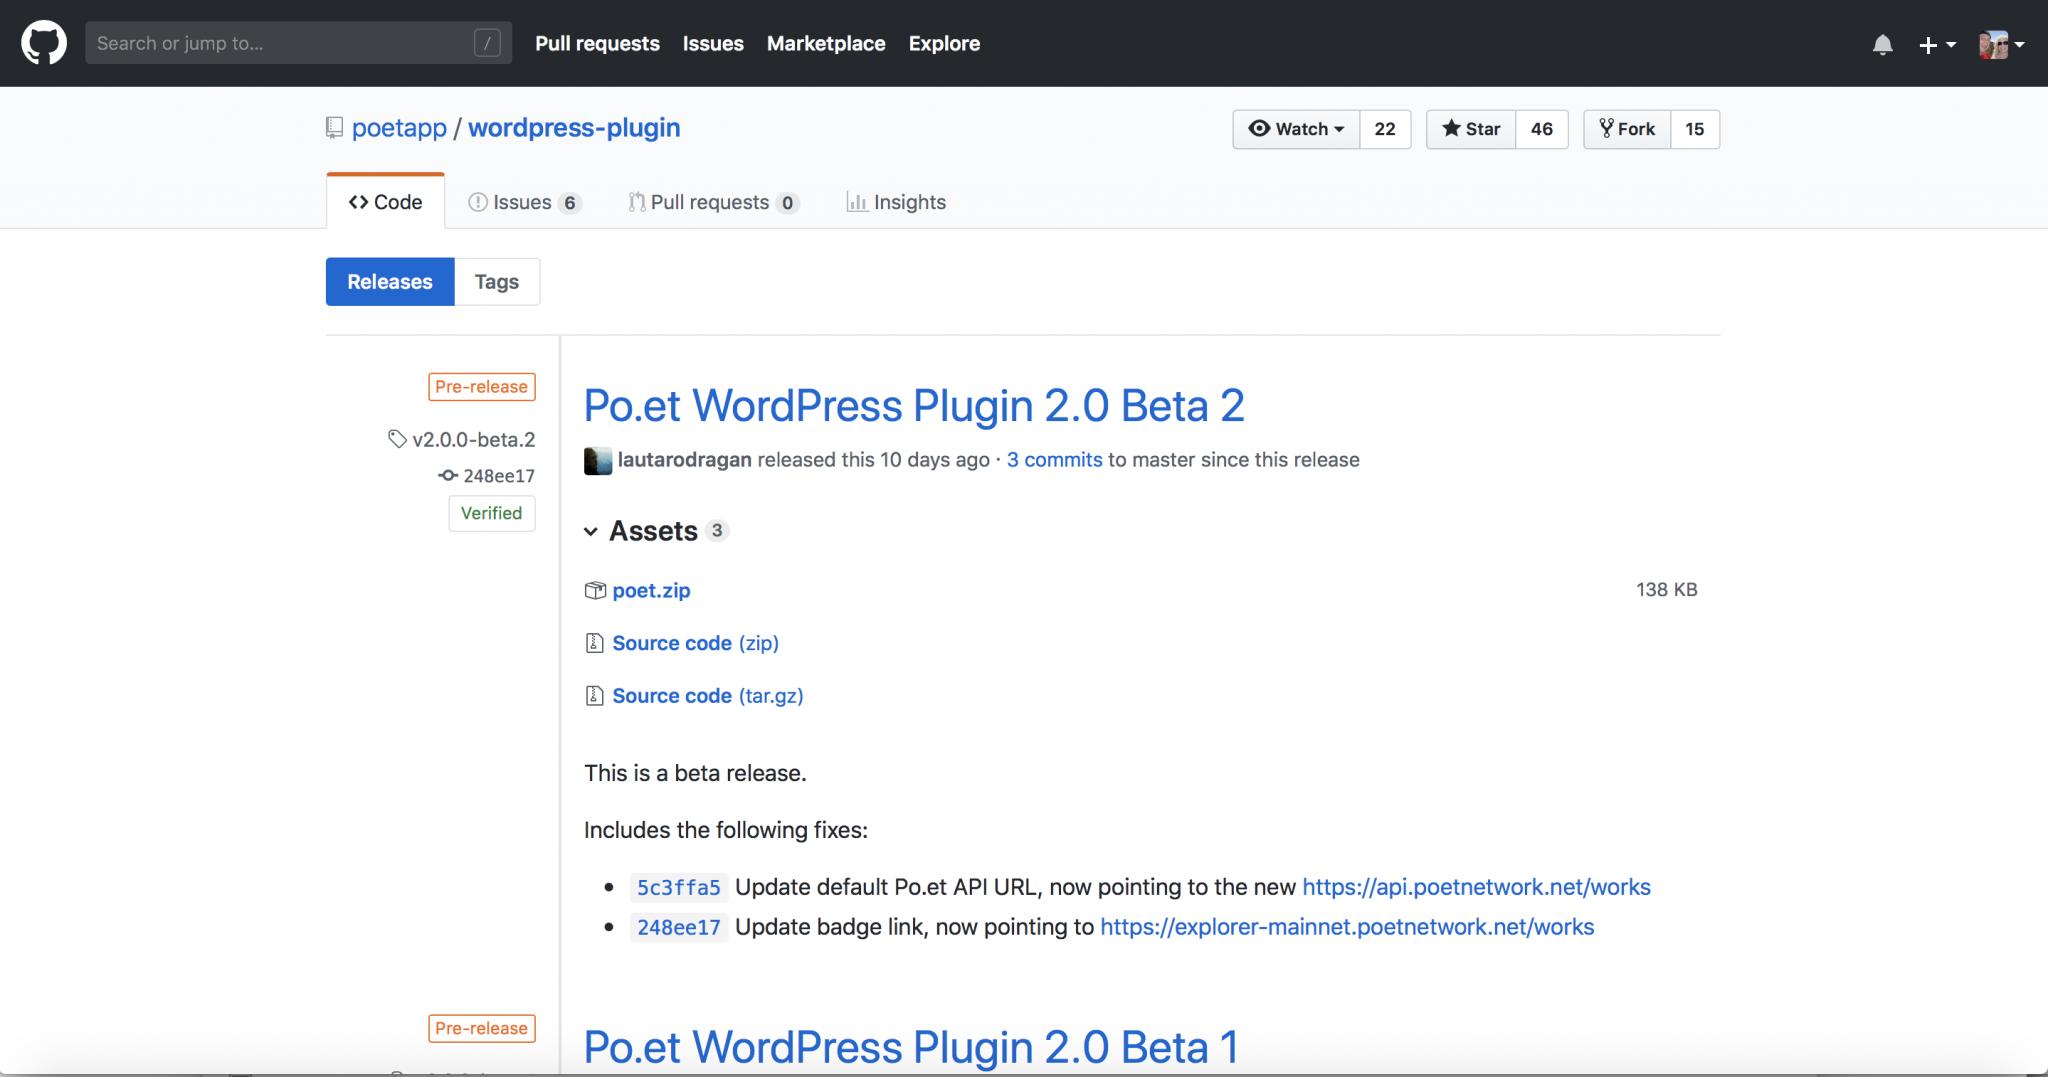 Po.et on Mainnet wordpress plug-in